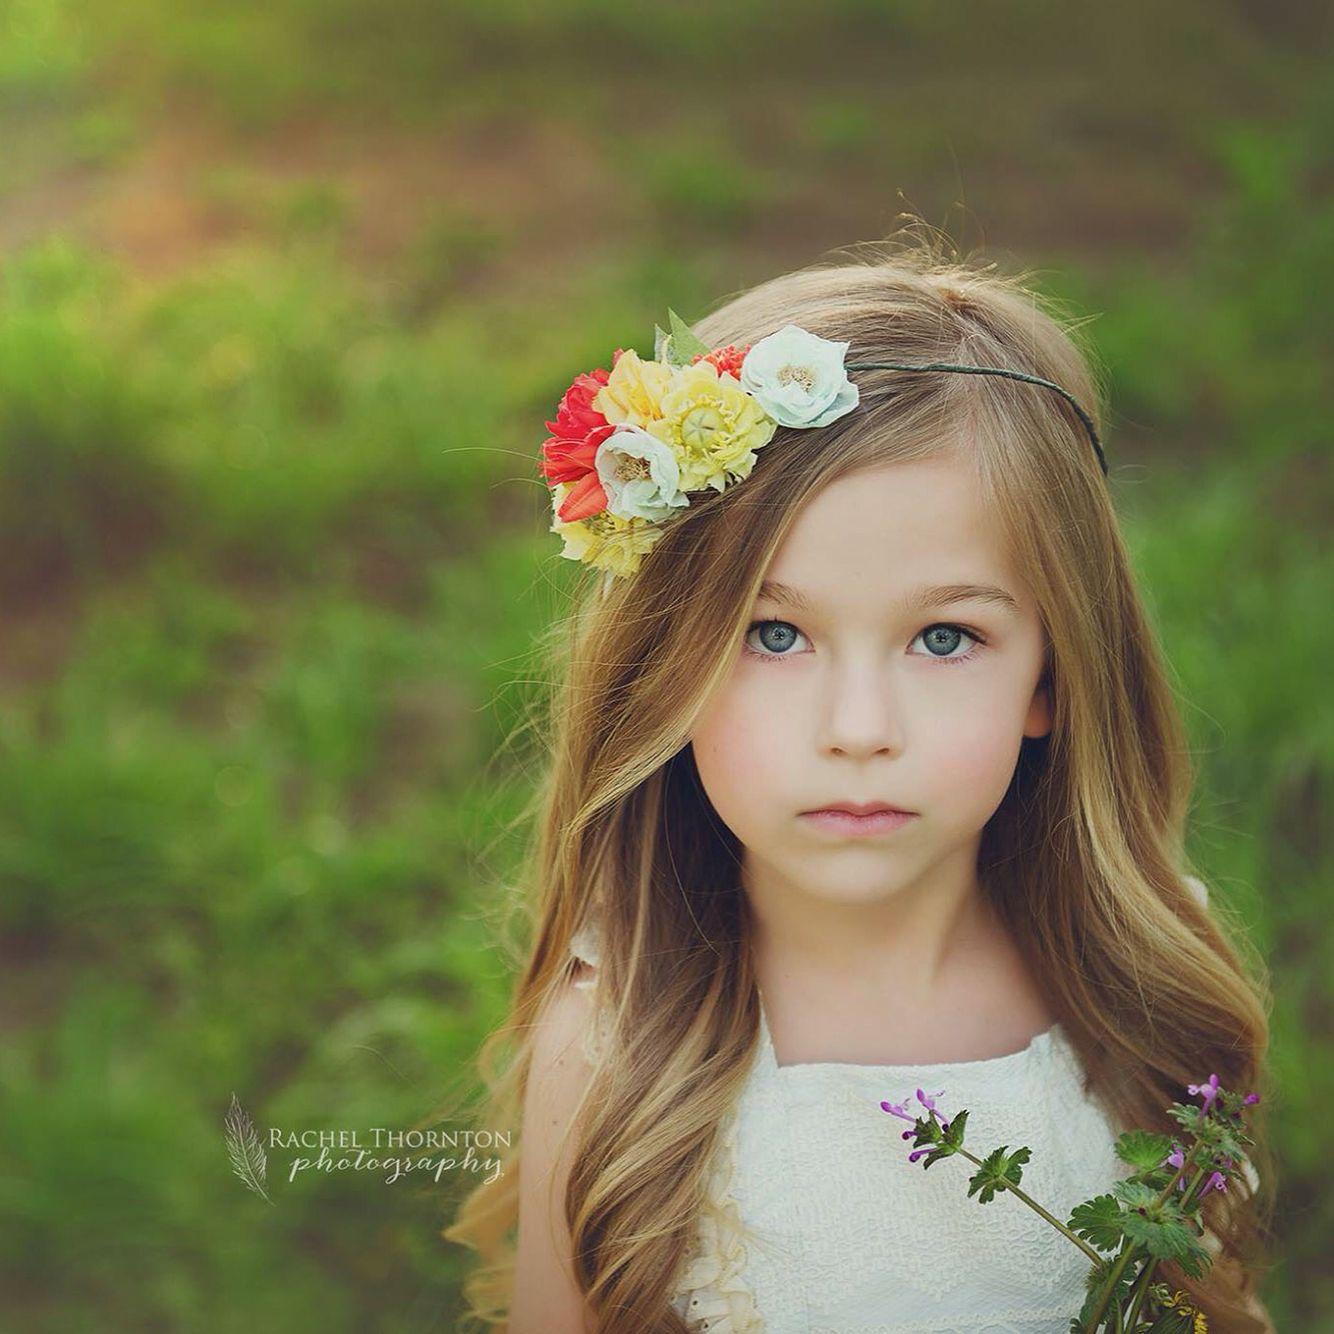 Flower halo by lavish photo taken by rachel thornton photography